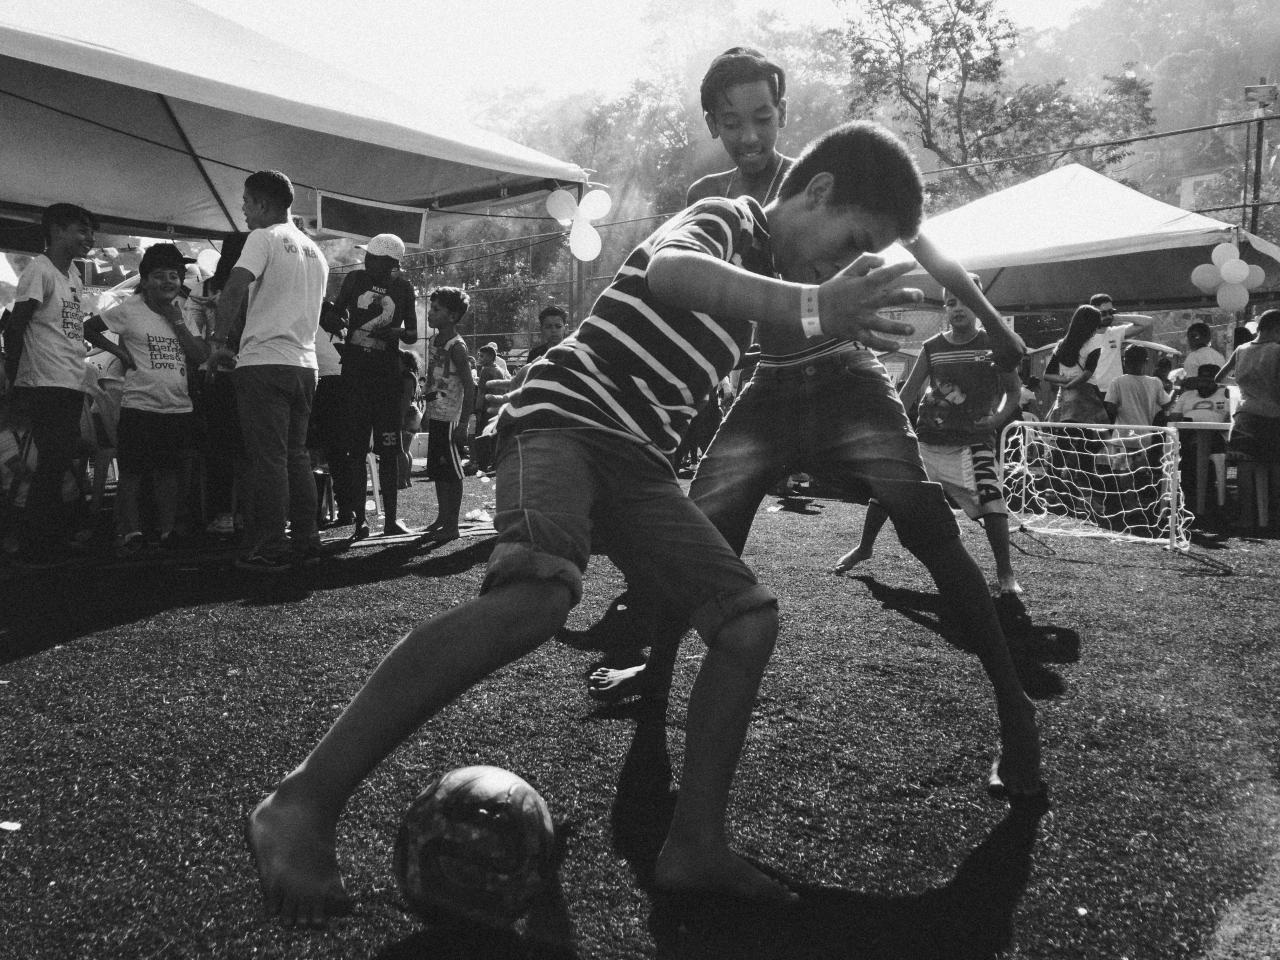 Referensi Konveksi Kaos Jersey Futsal dan Bola di Surabaya 1